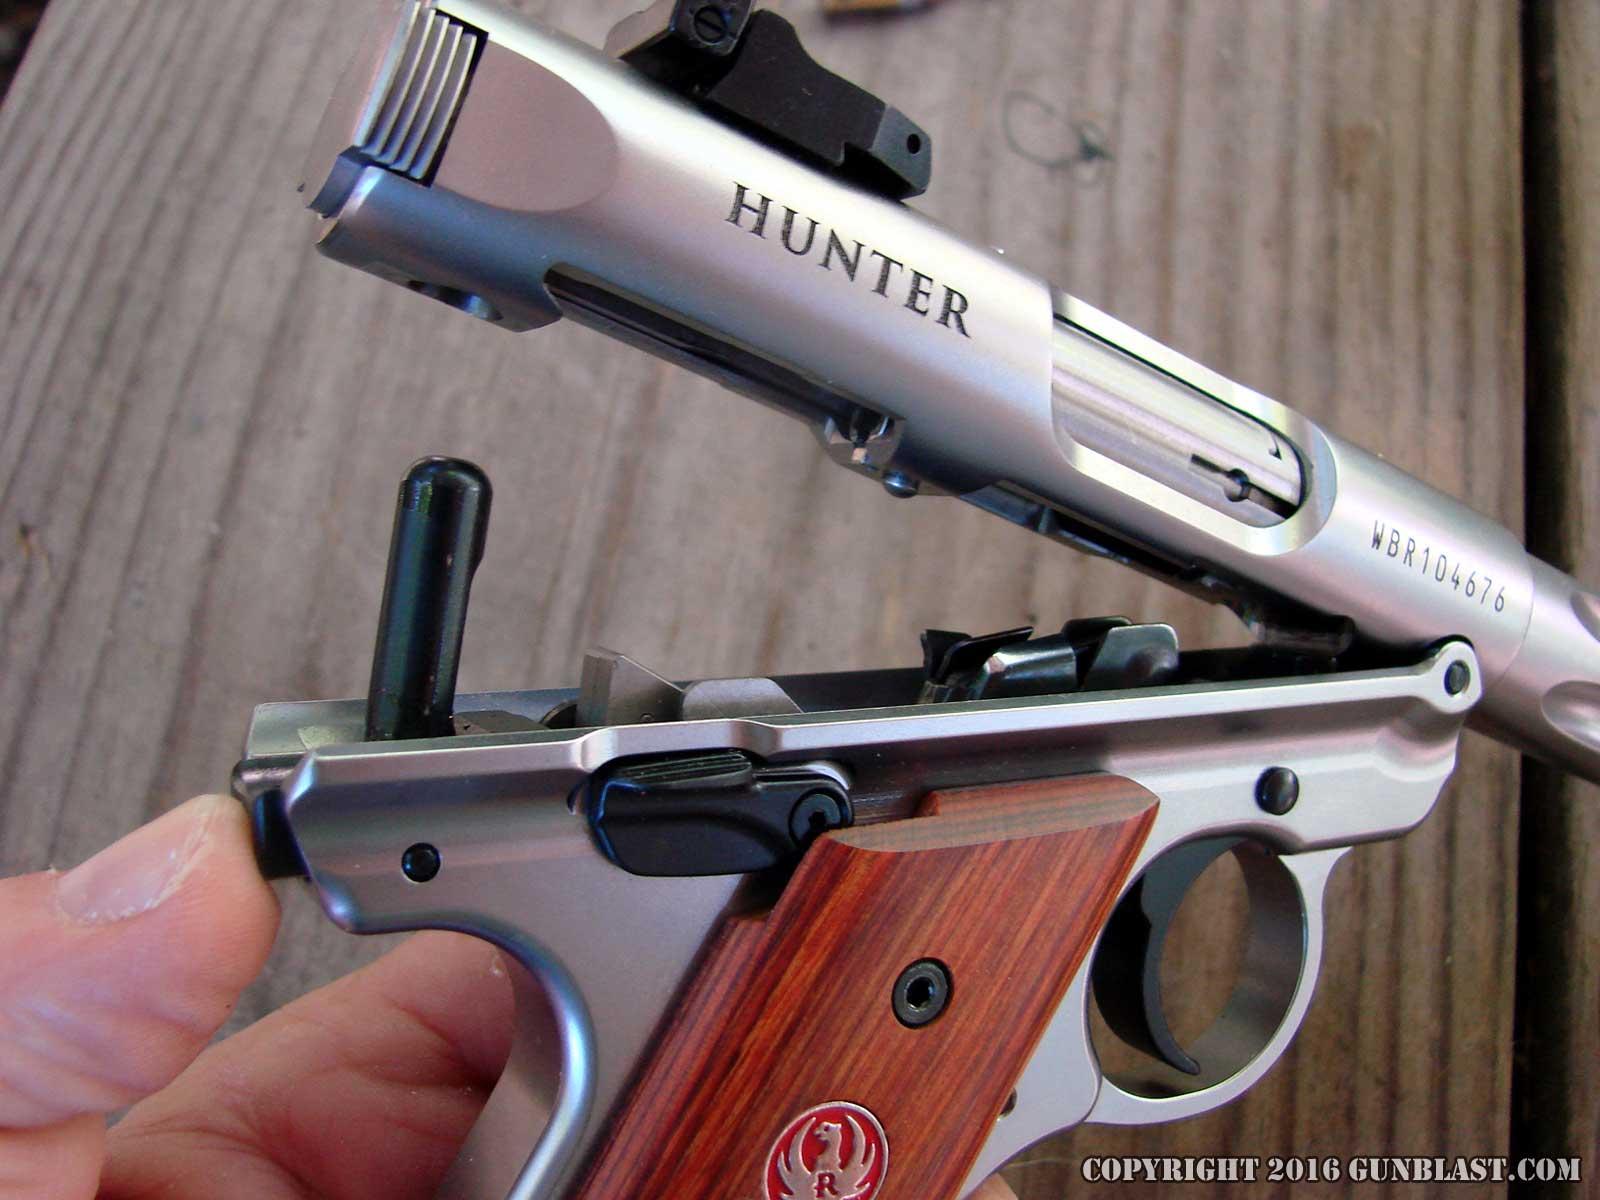 Biggest Pistol Ever Made